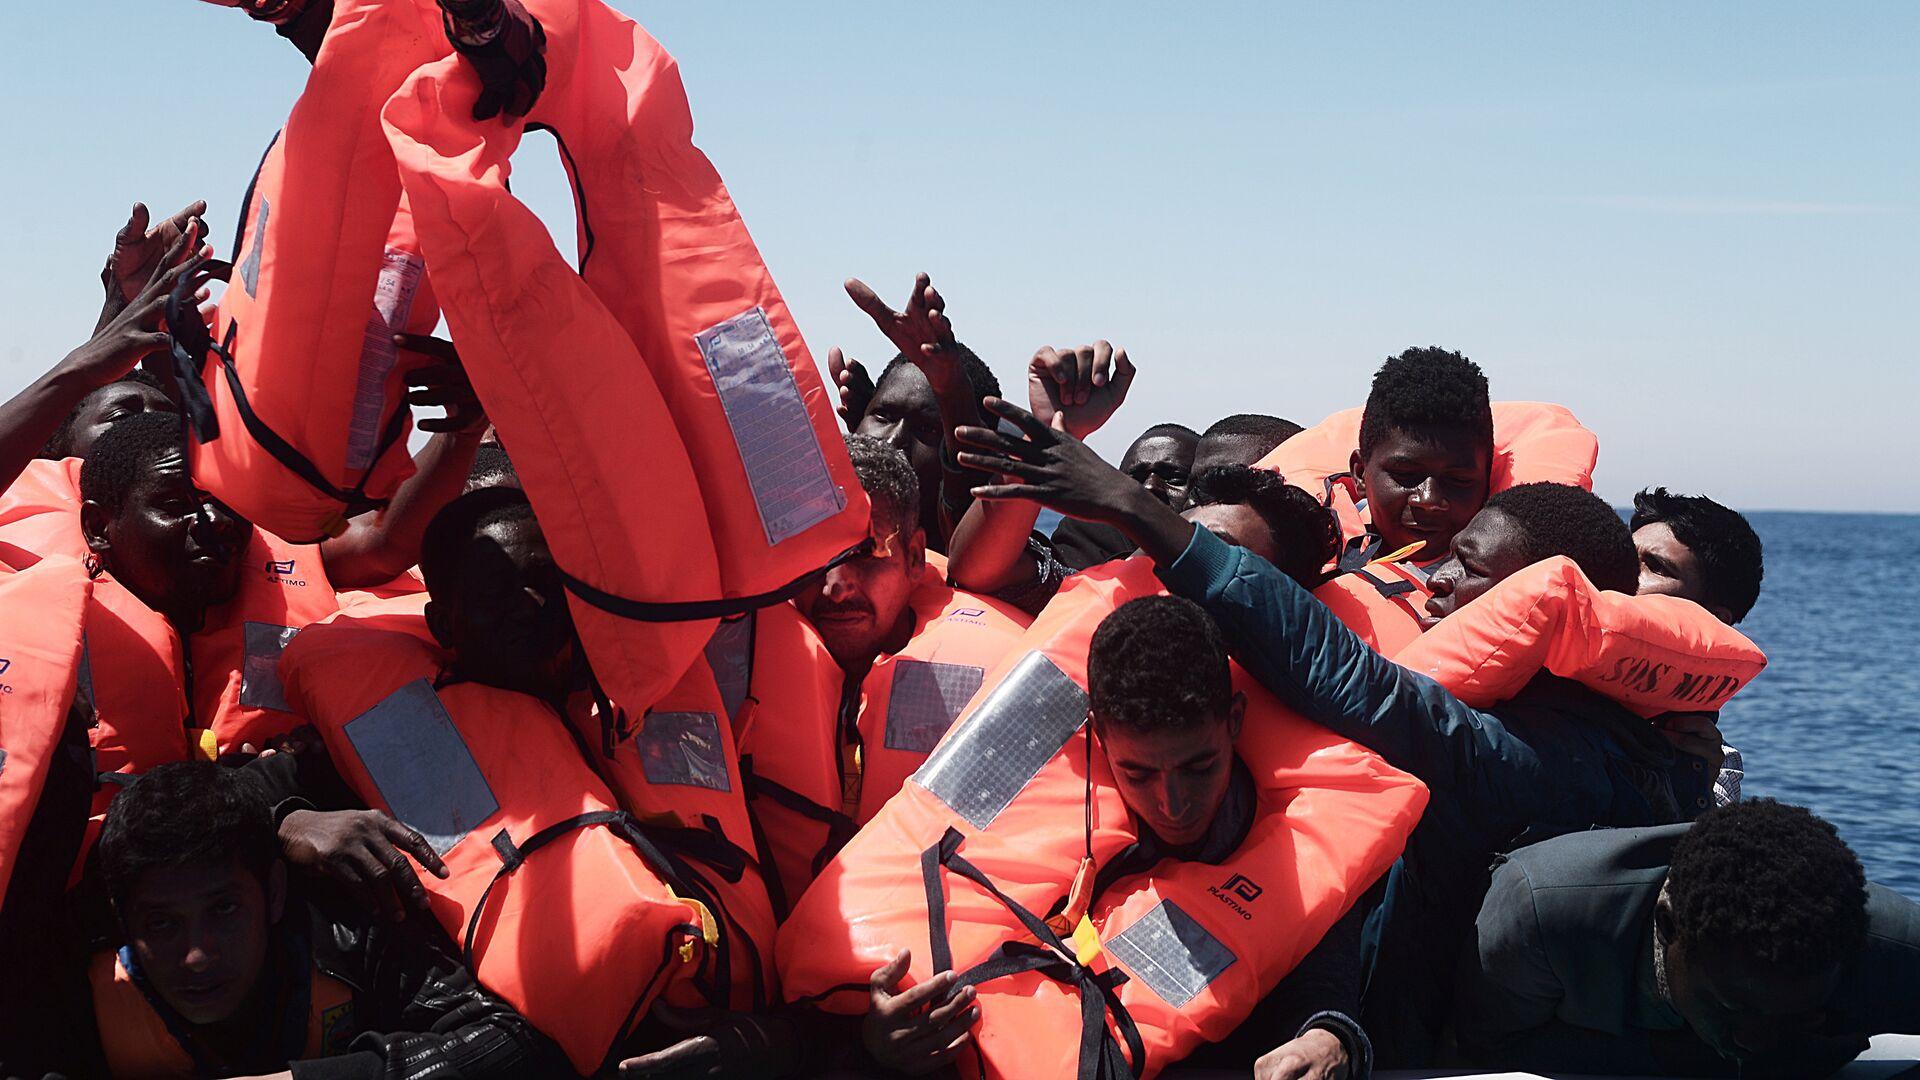 Migranti a bordo della nave Aquarius delle ONG SOS Mediteranee e Medici senza frontiere - Sputnik Italia, 1920, 23.08.2021